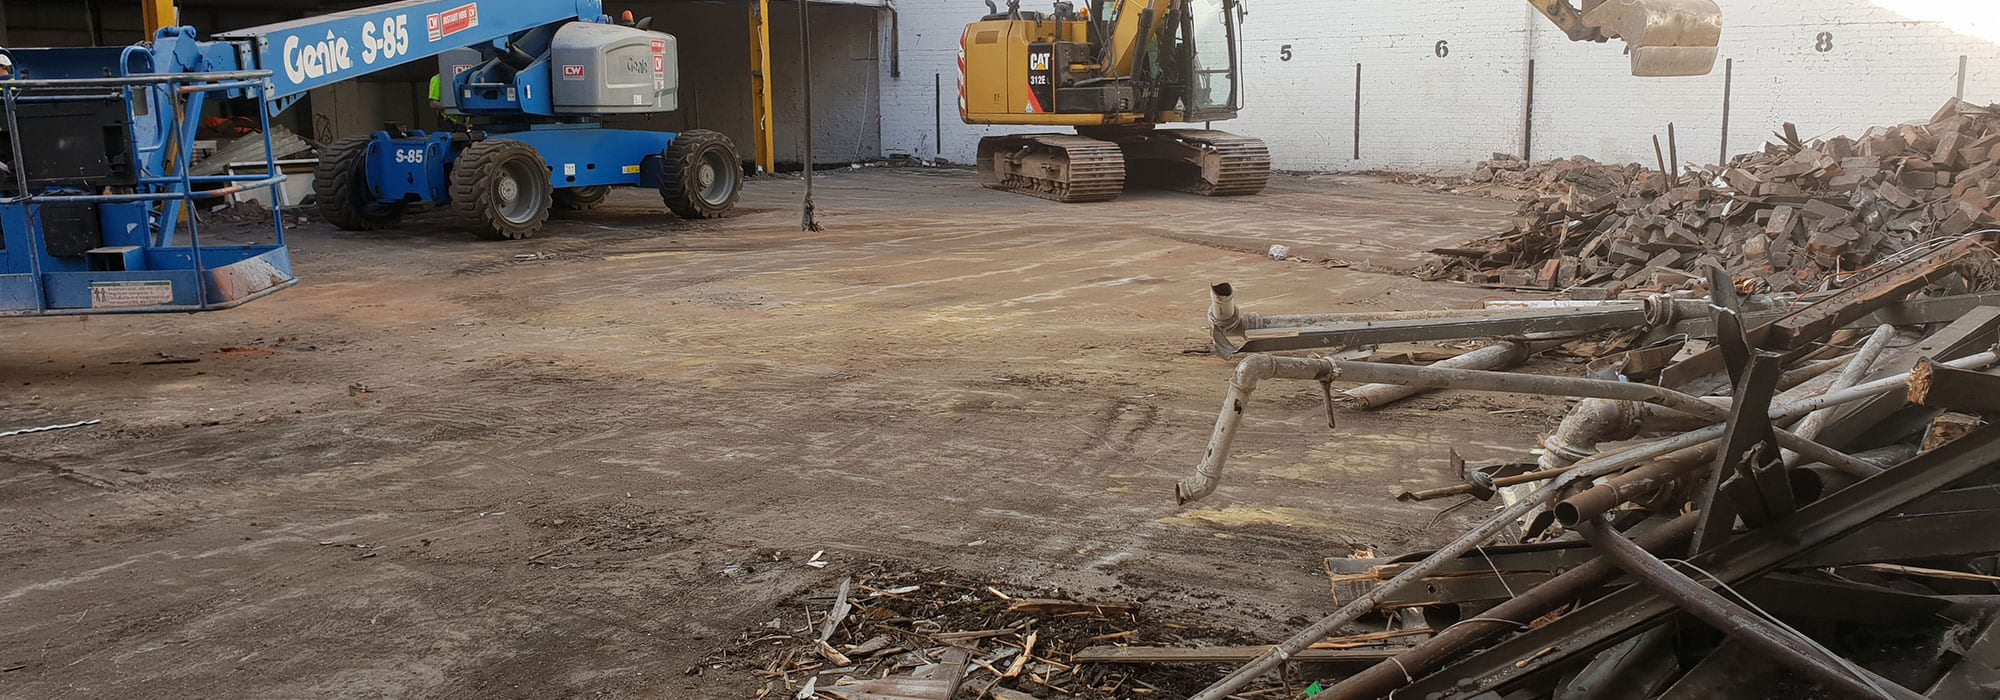 Demolition Featured Image